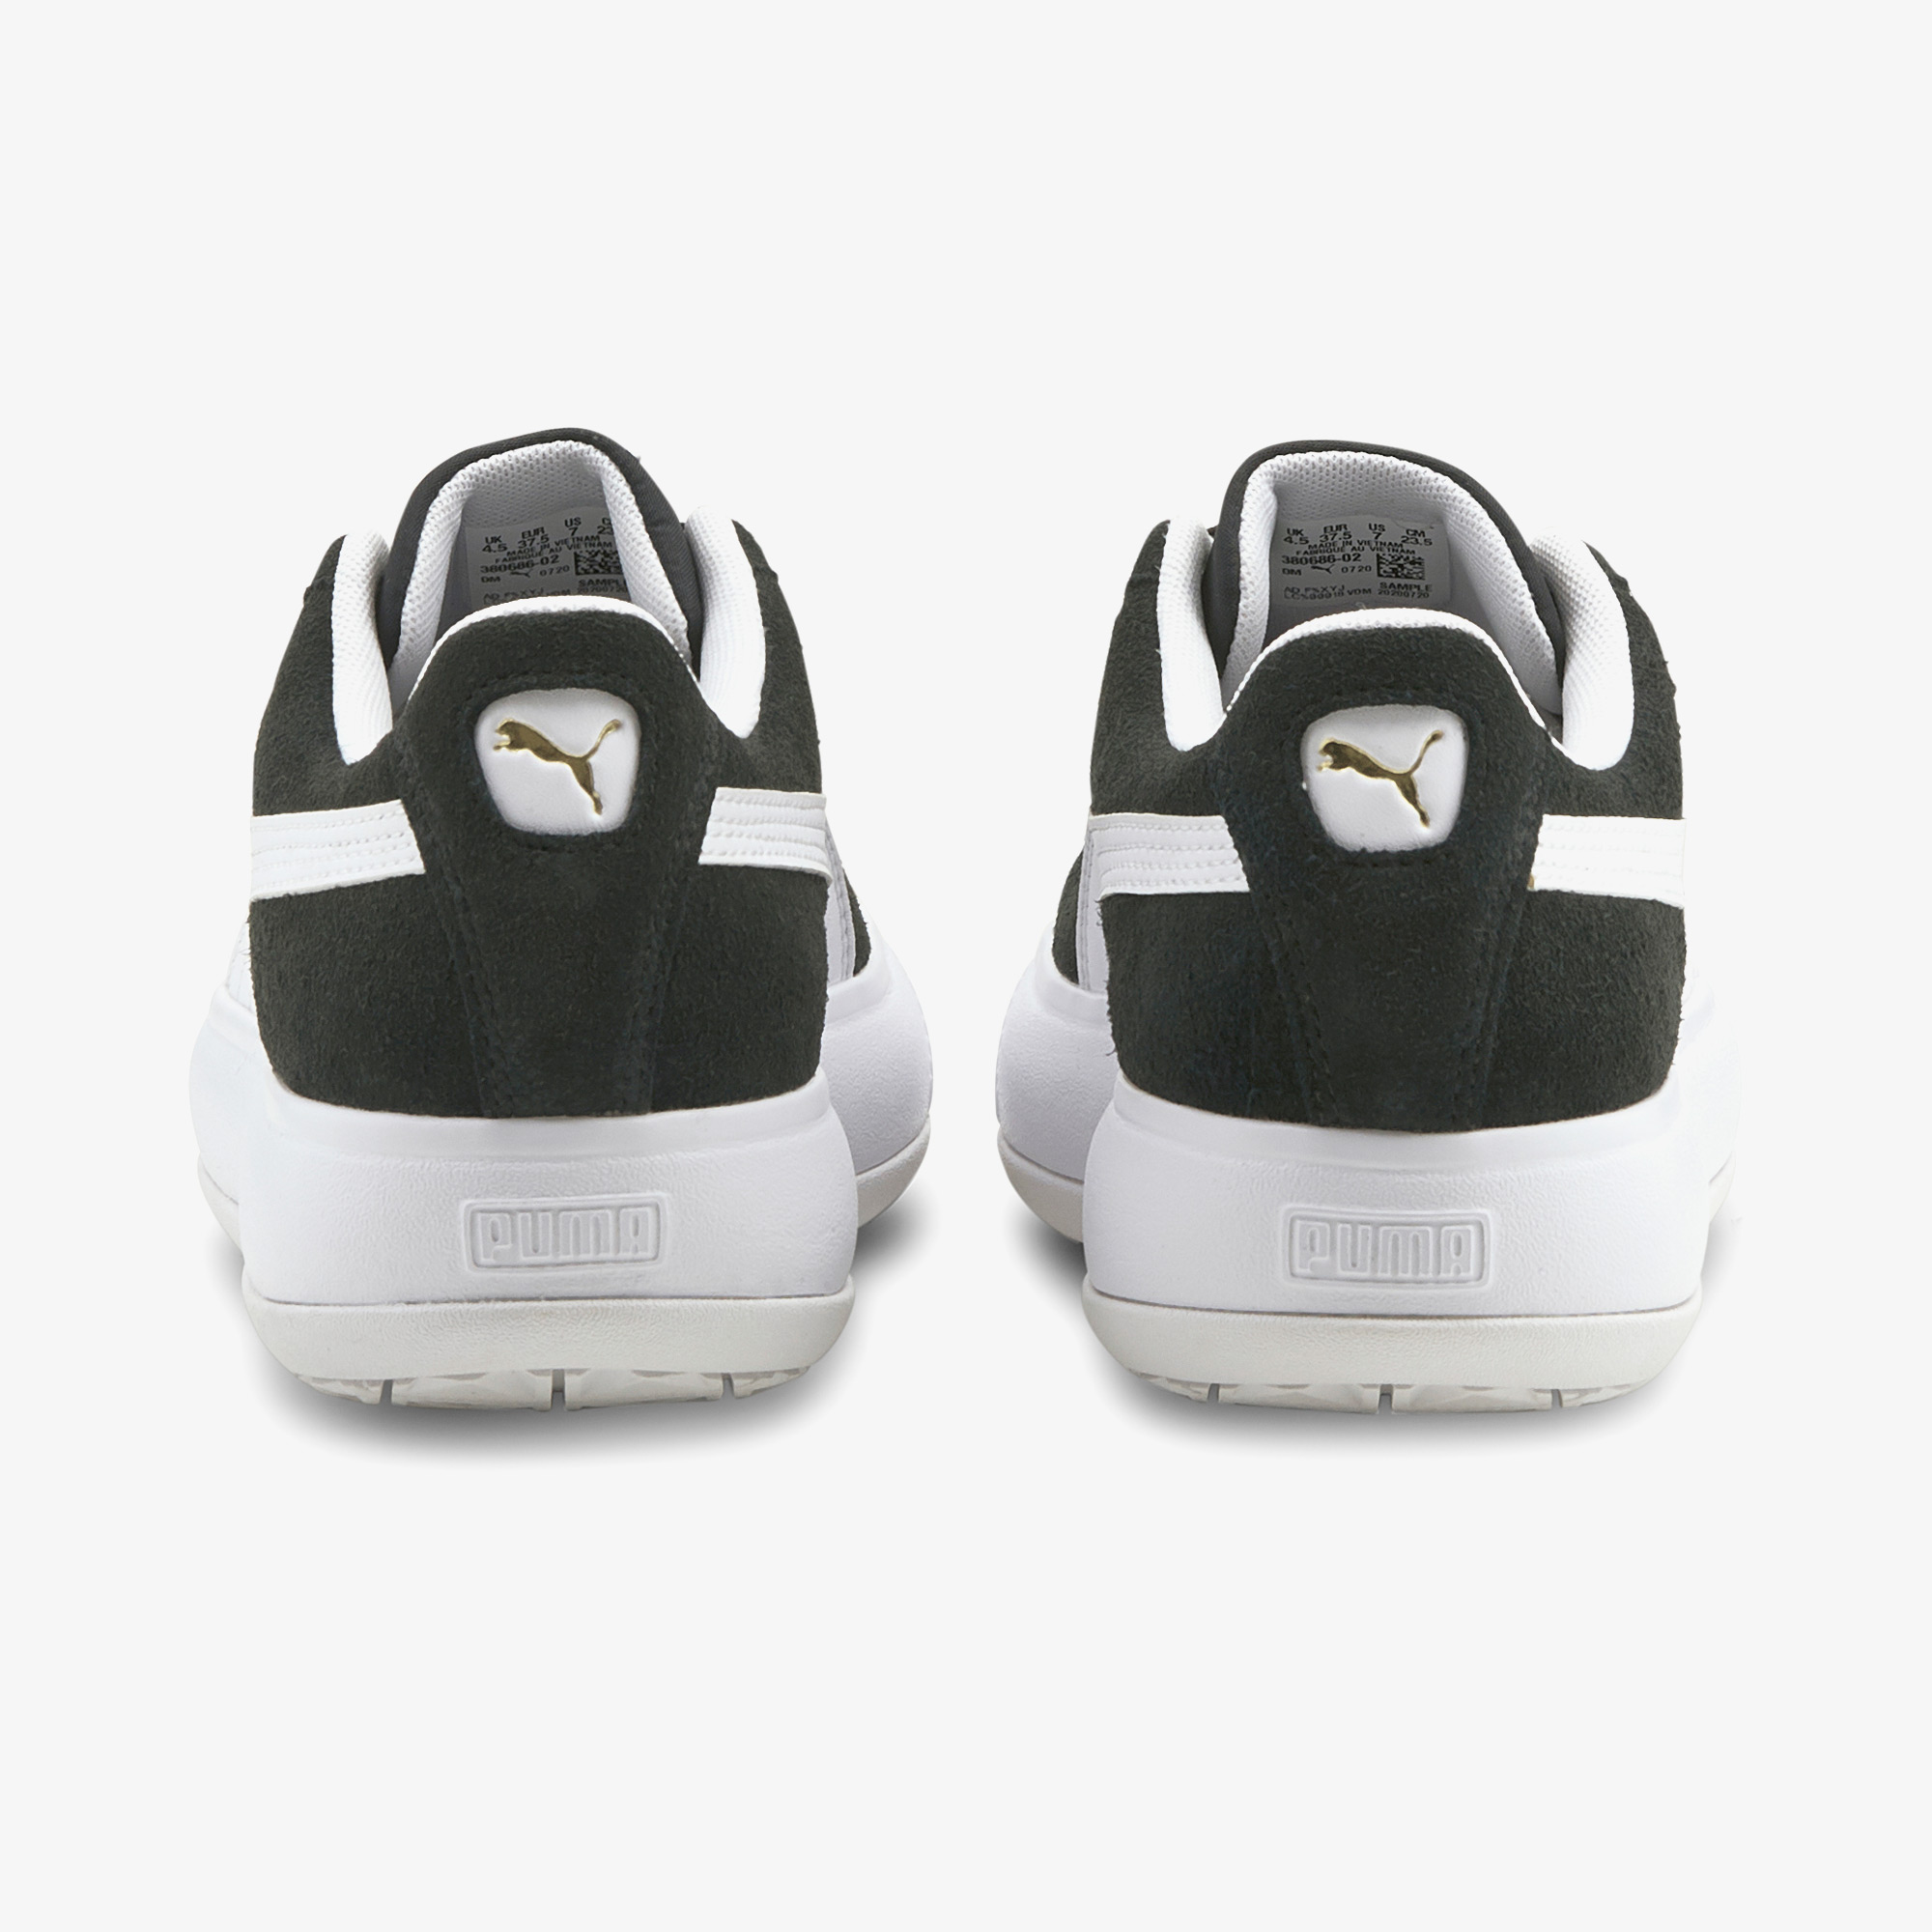 Puma Suede Mayu Kadın Platform Siyah Spor Ayakkabı